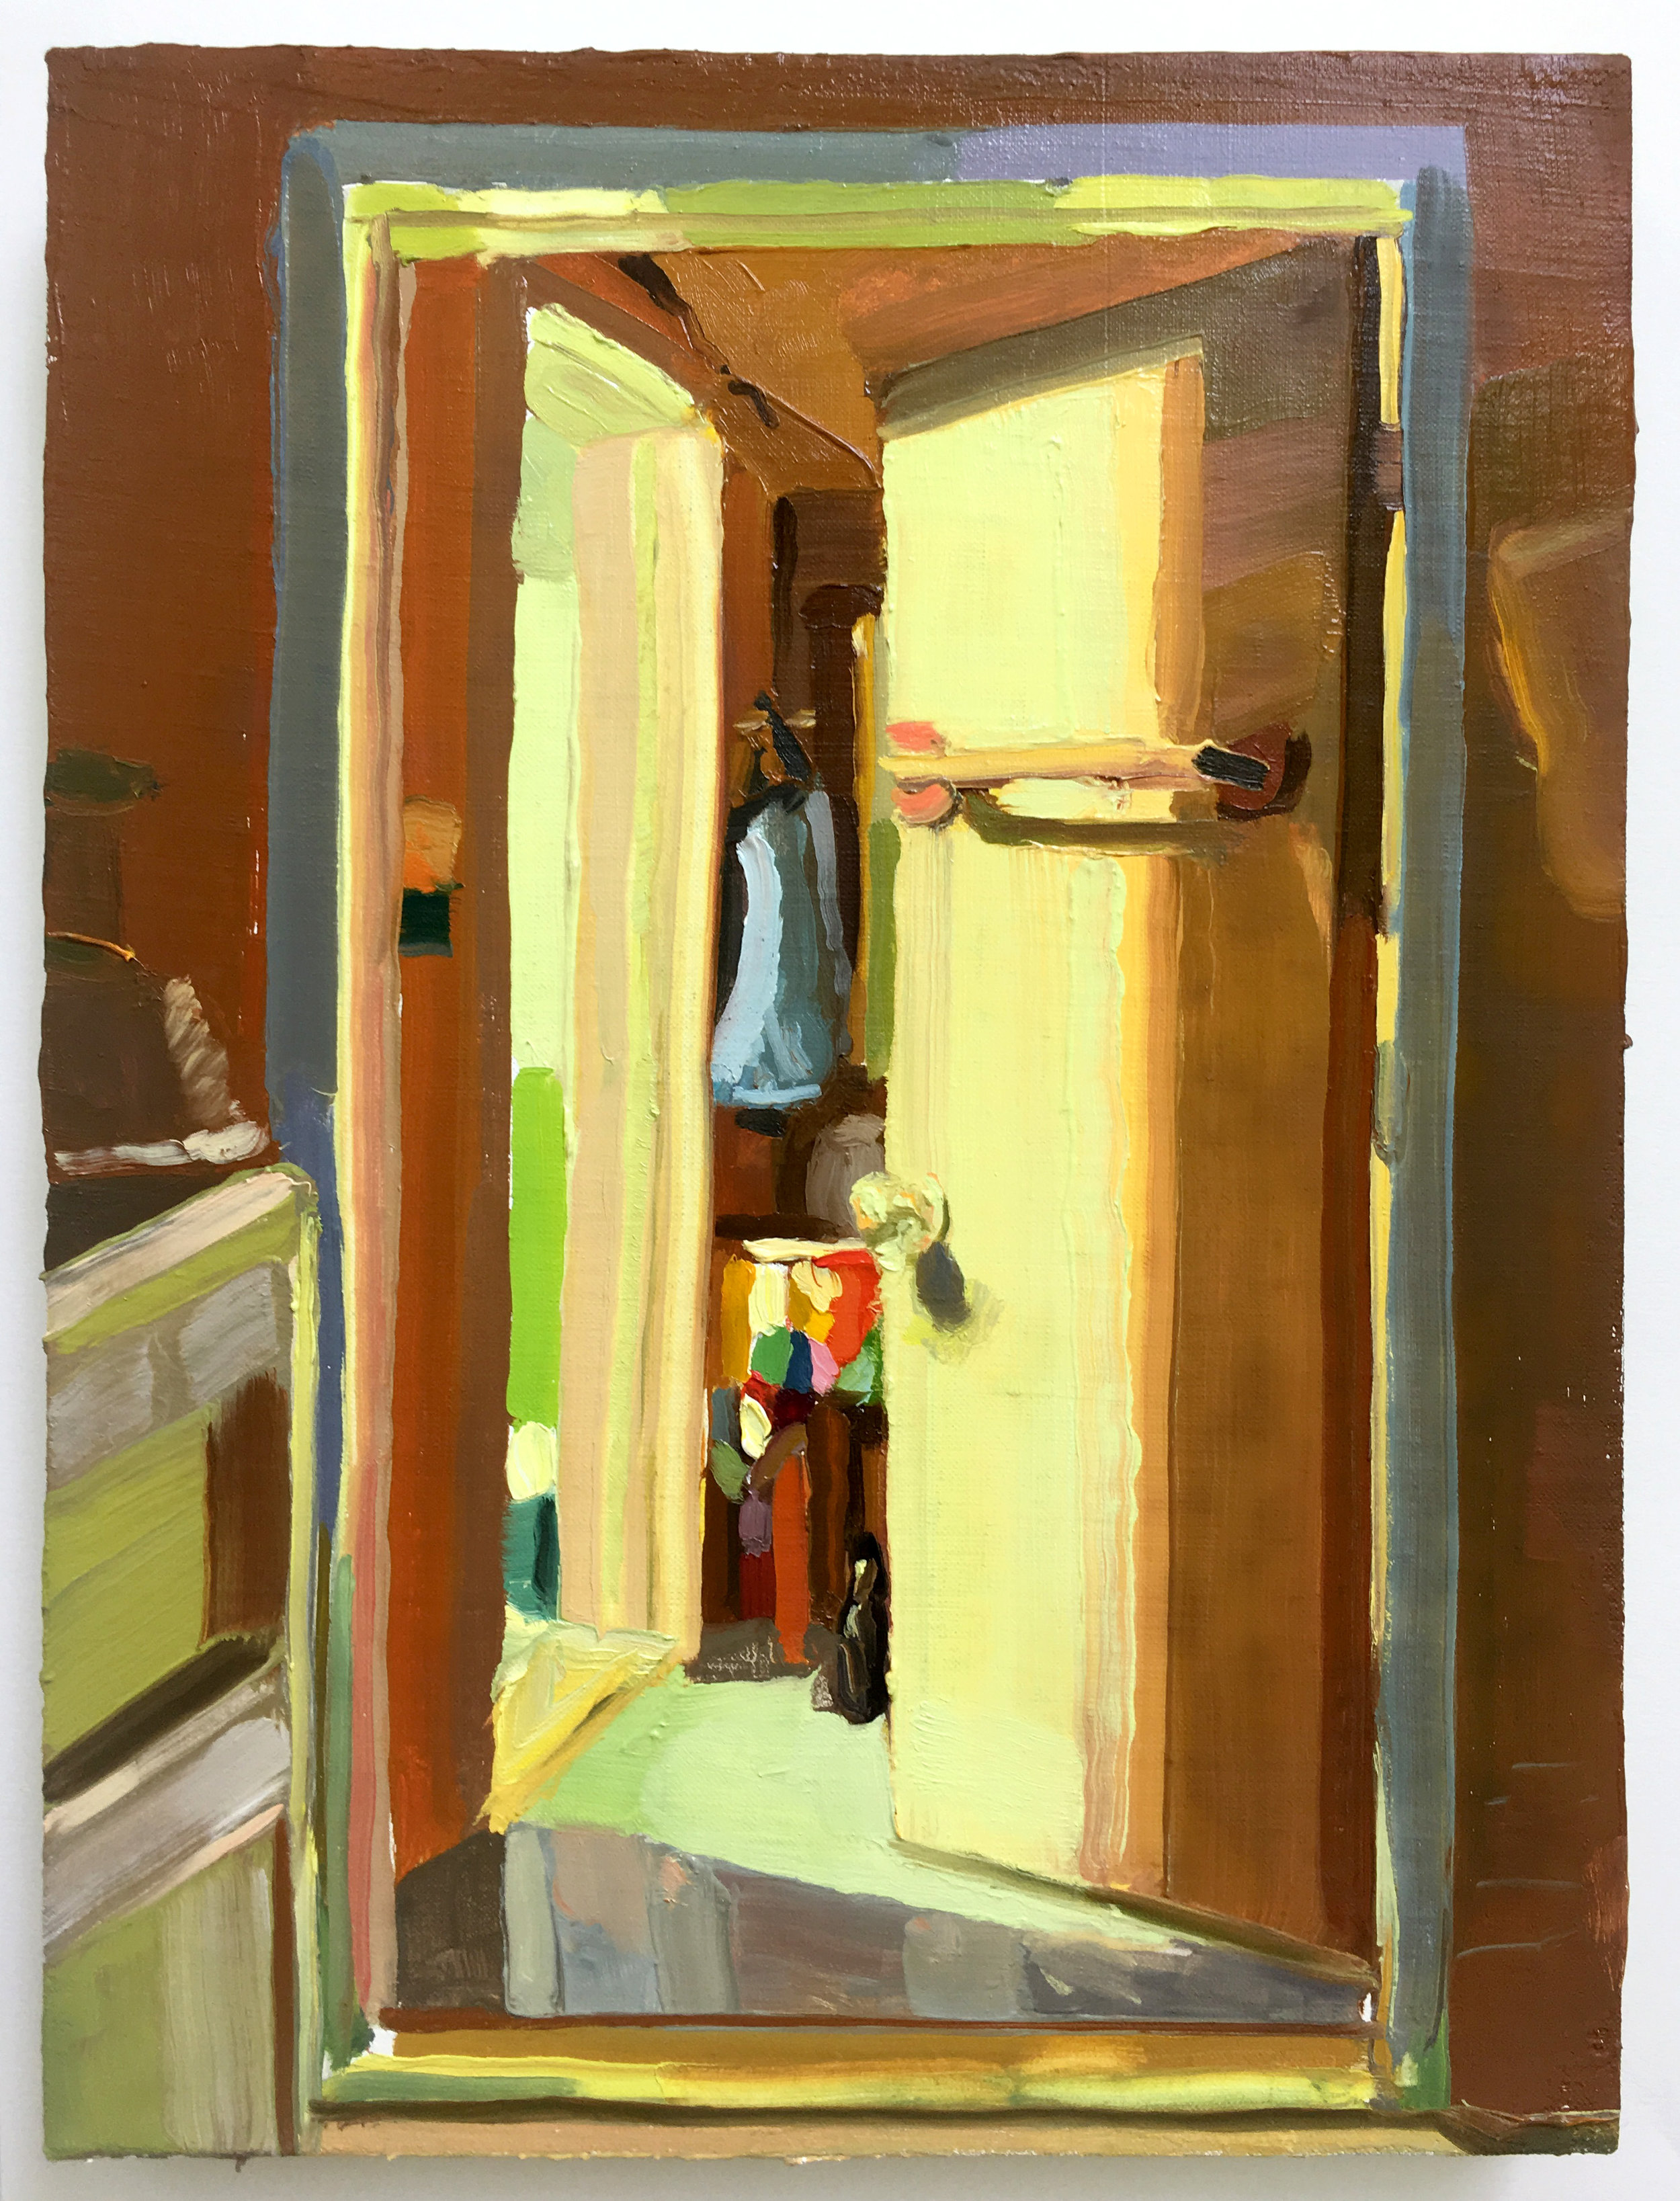 Keiran Brennan Hinton, Bathroom Light, 2017, oil on linen, 12 x 9 inches